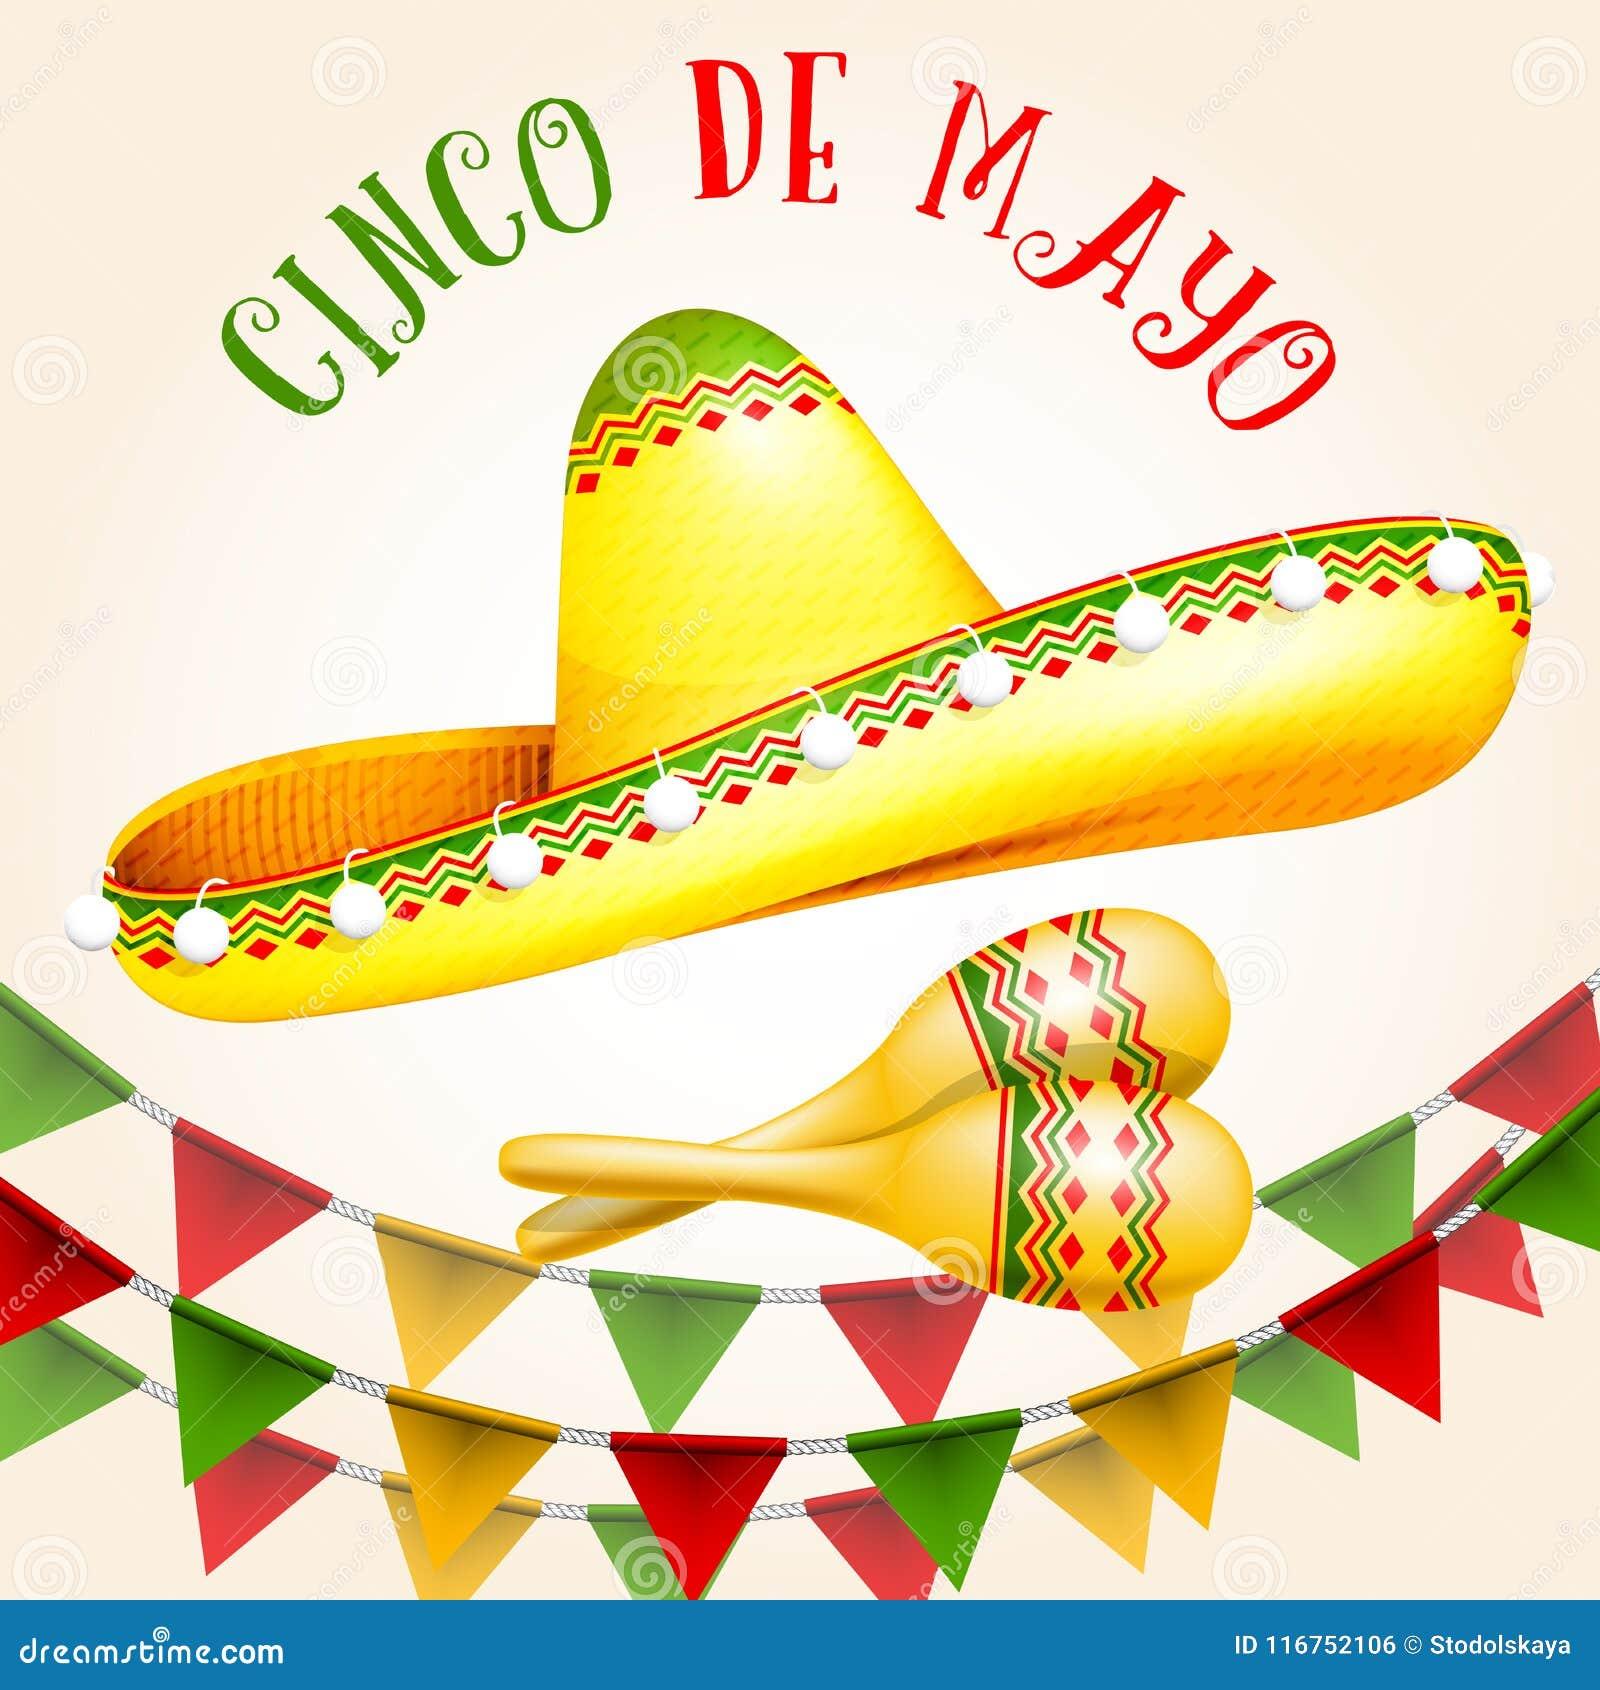 Cinco de Mayo affisch med sombreron och maracas